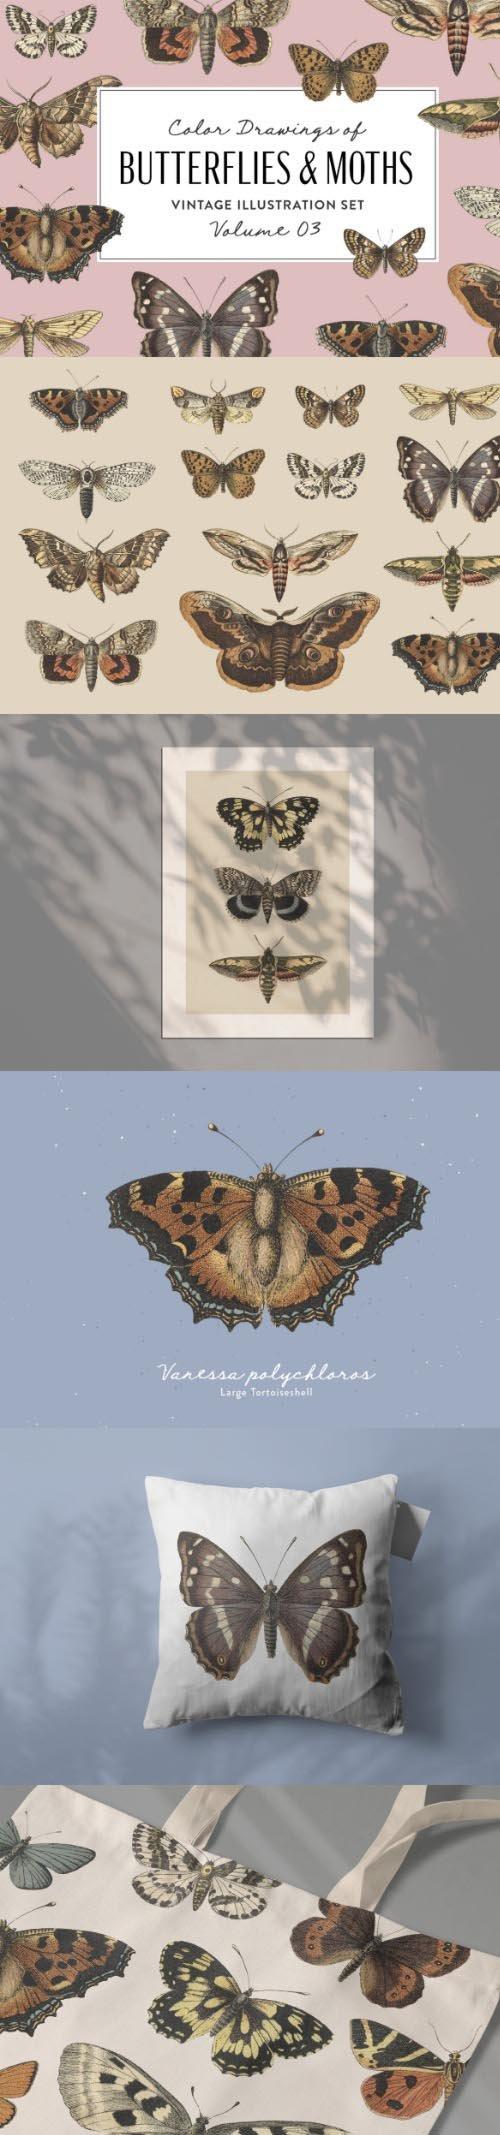 Butterflies & Moths Vintage Graphics Vol. 3 PNG